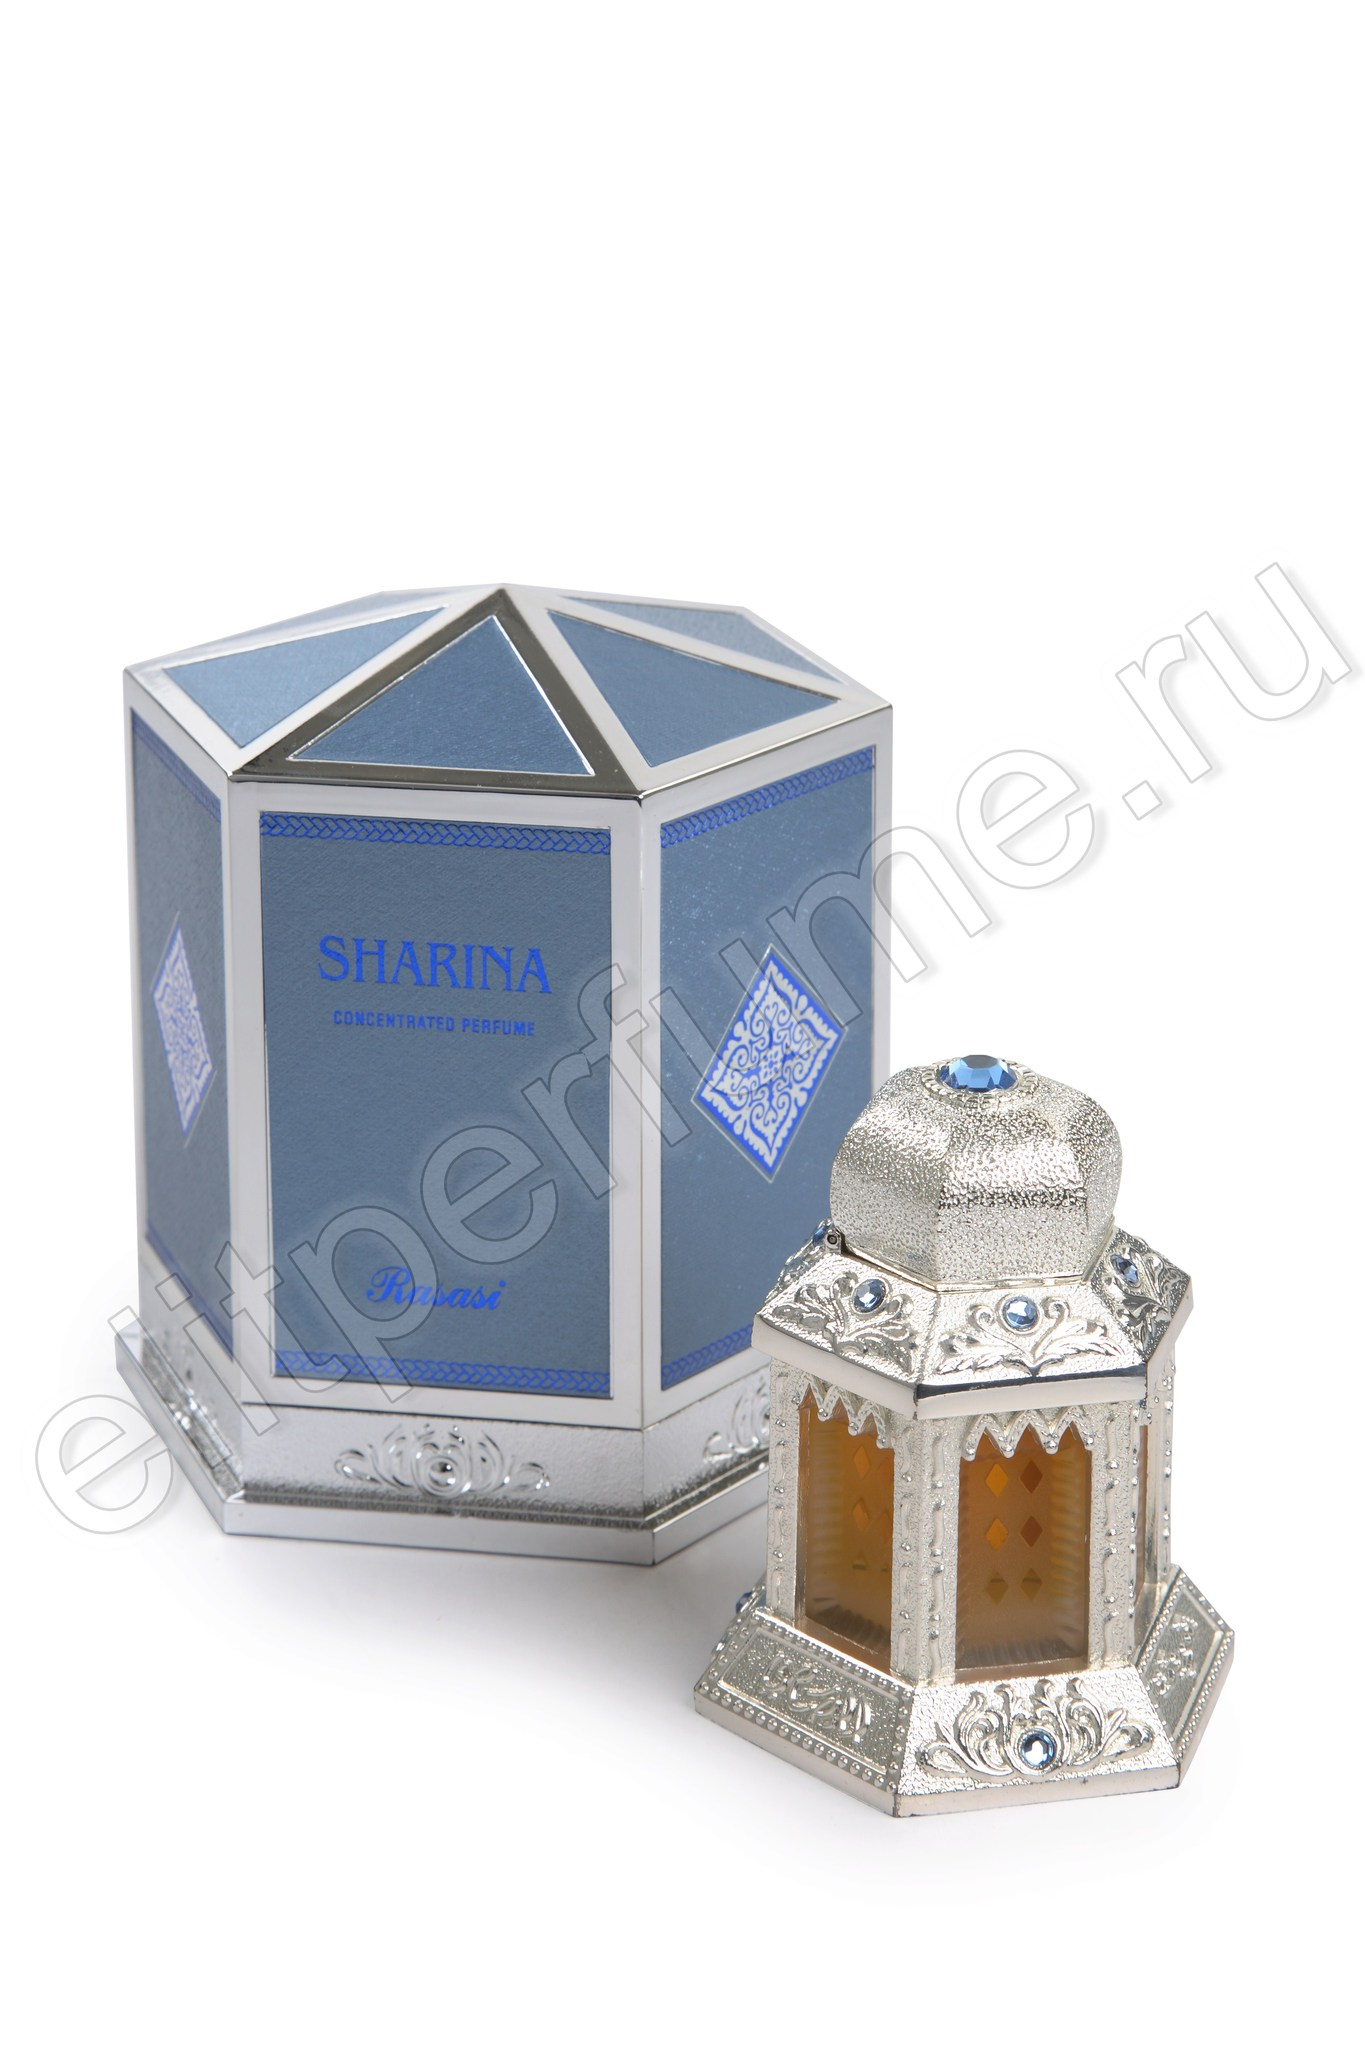 Шарина Мухаллат Денал Уд Sharina Mukhallat Dhanel Oudh 30 мл арабские масляные духи от Расаси Rasasi Perfumes